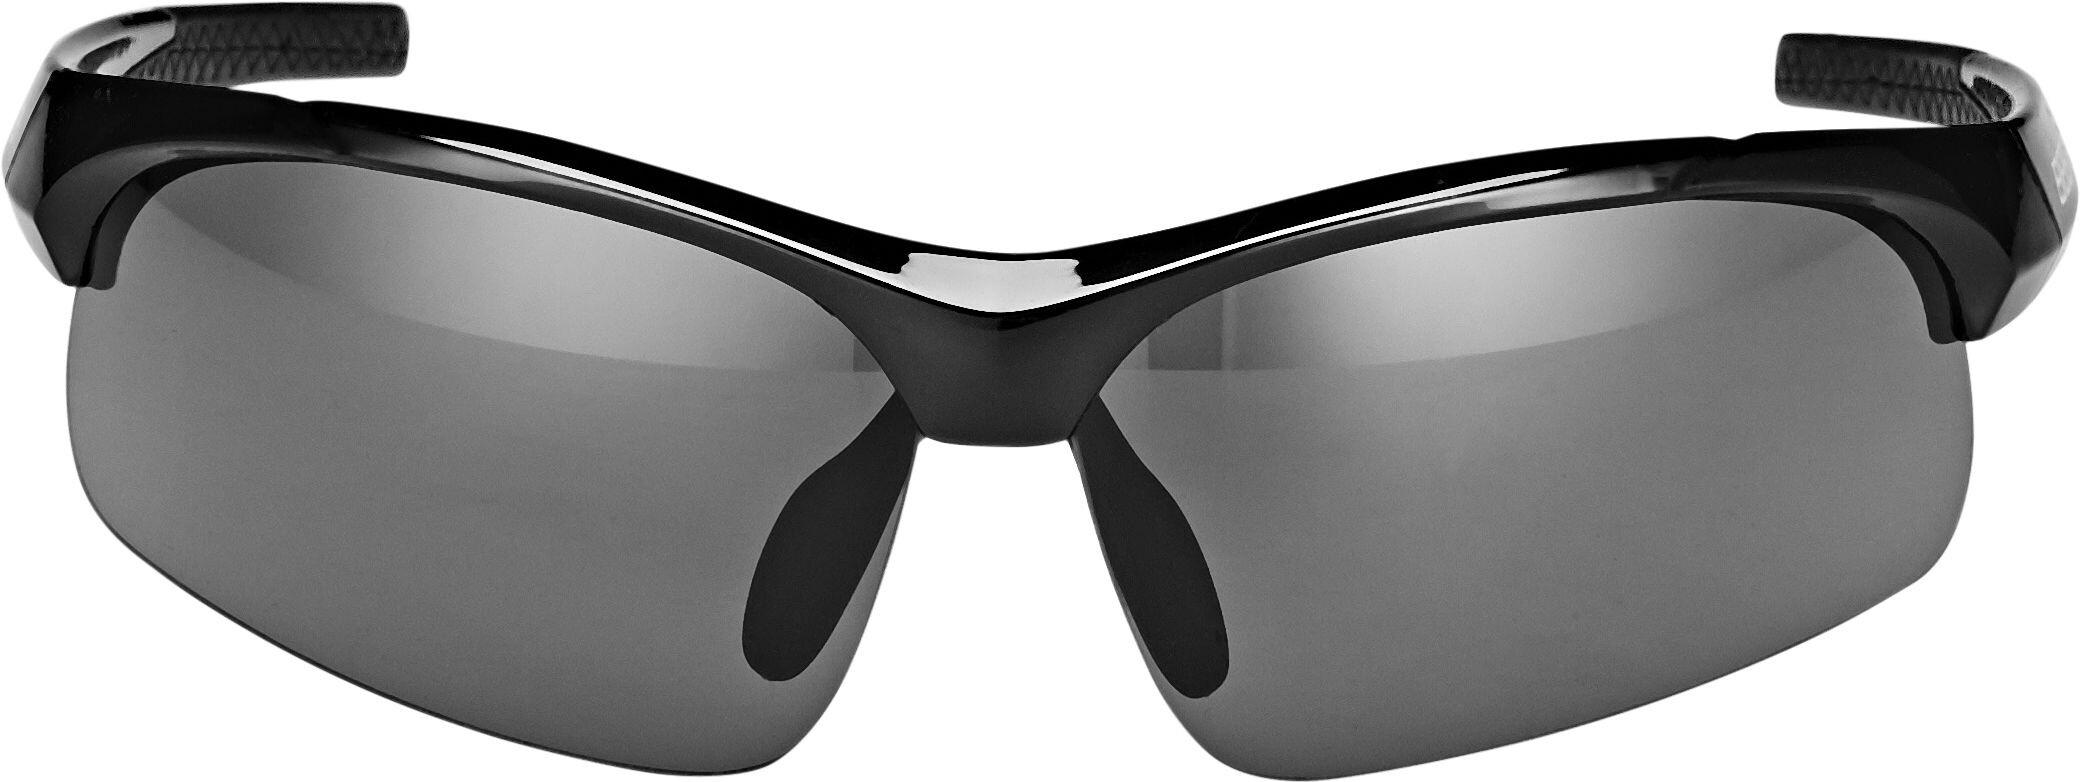 50970a19bfd BBB Impress Small BSG-48 Bike Glasses black at Bikester.co.uk